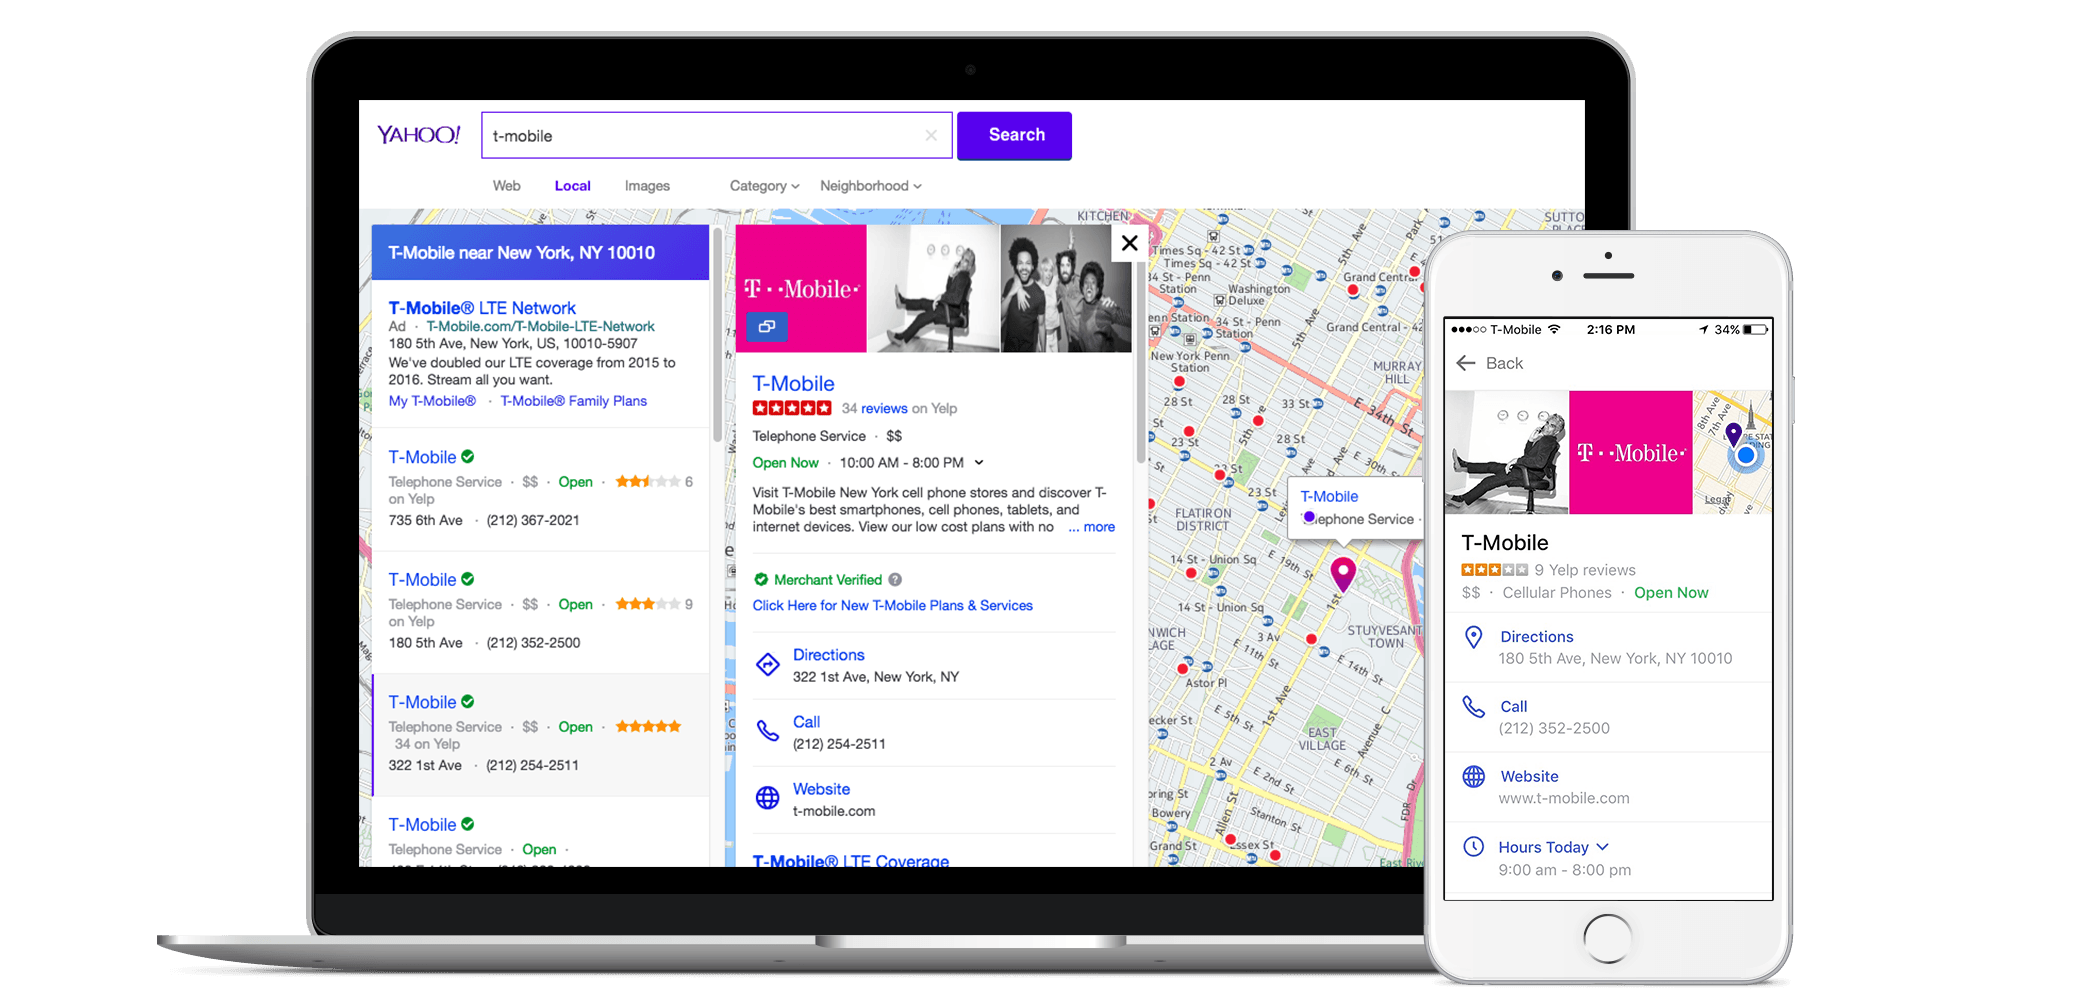 products-listings-Yahoo-hero